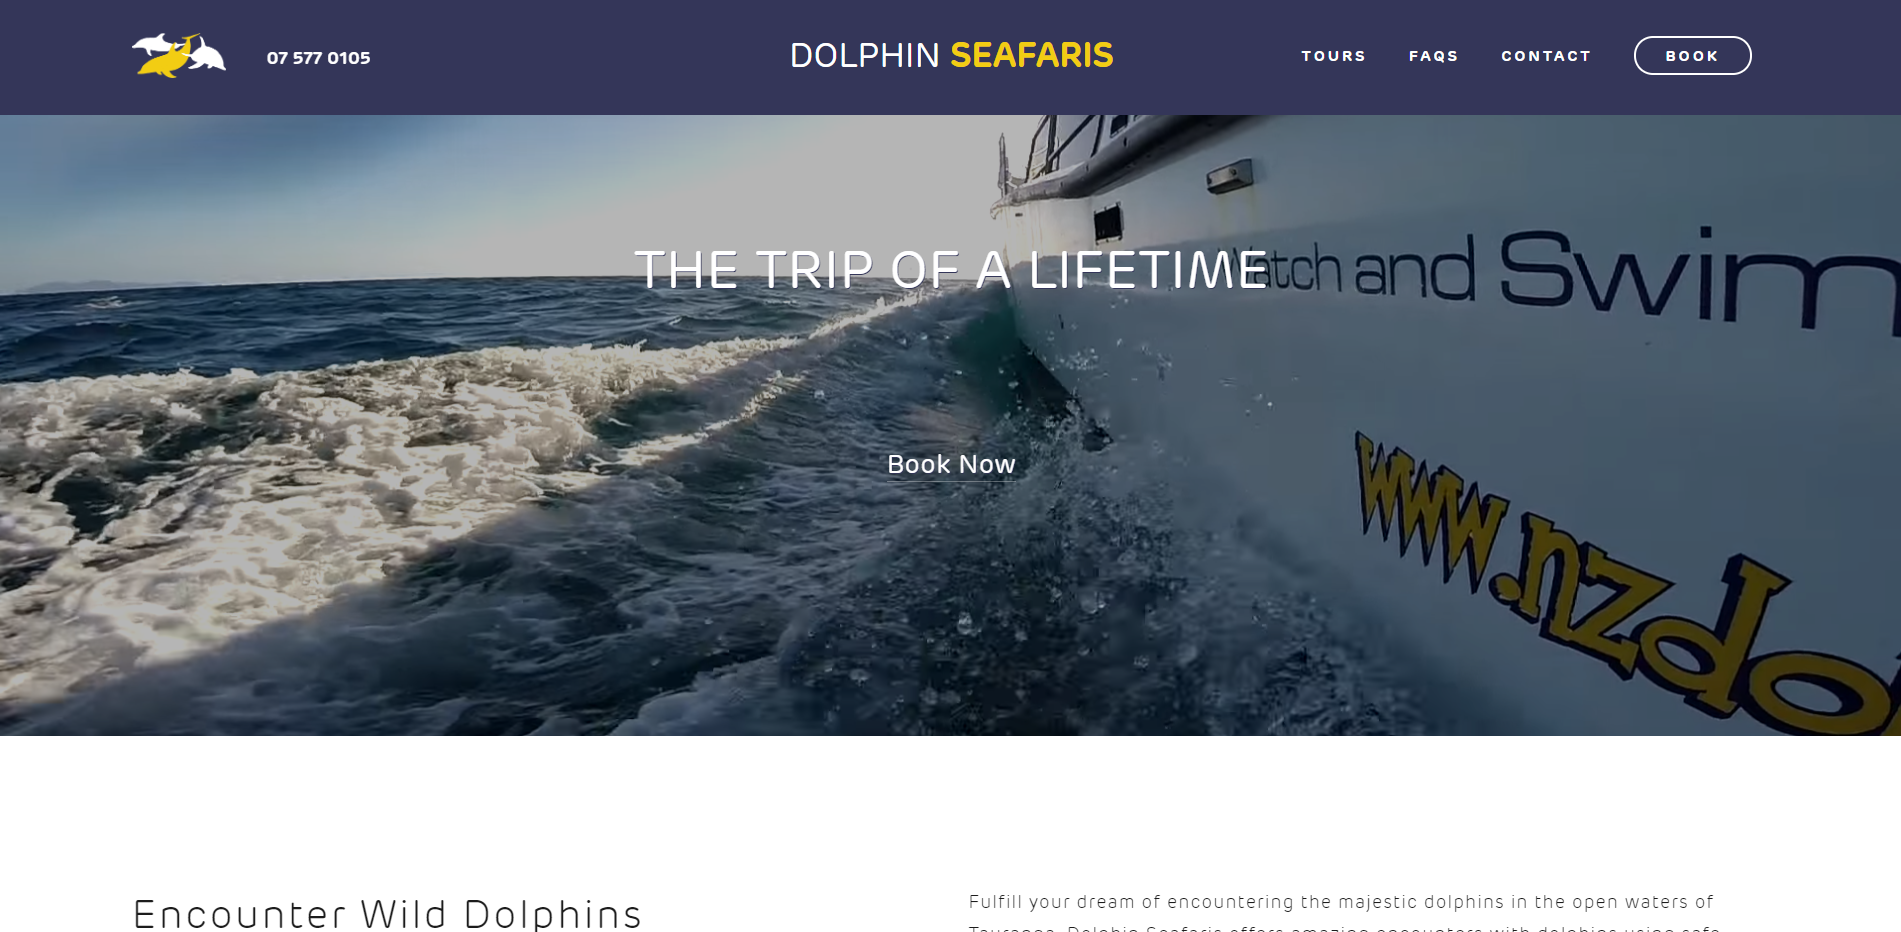 dolphin seafaris website design.PNG